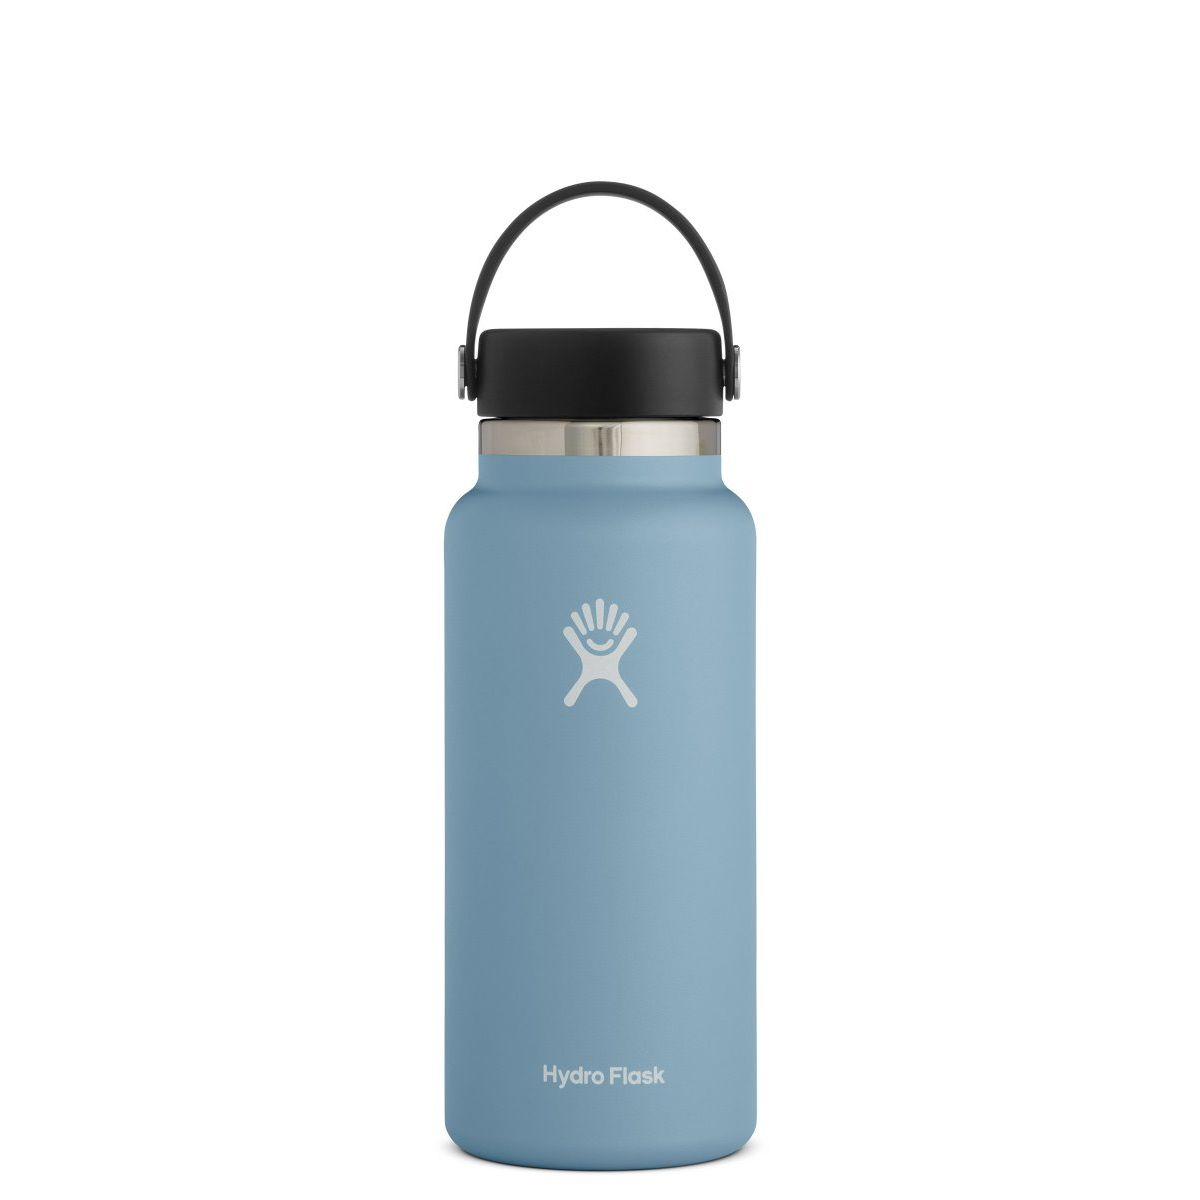 Hydroflask 32 oz standard cap rain